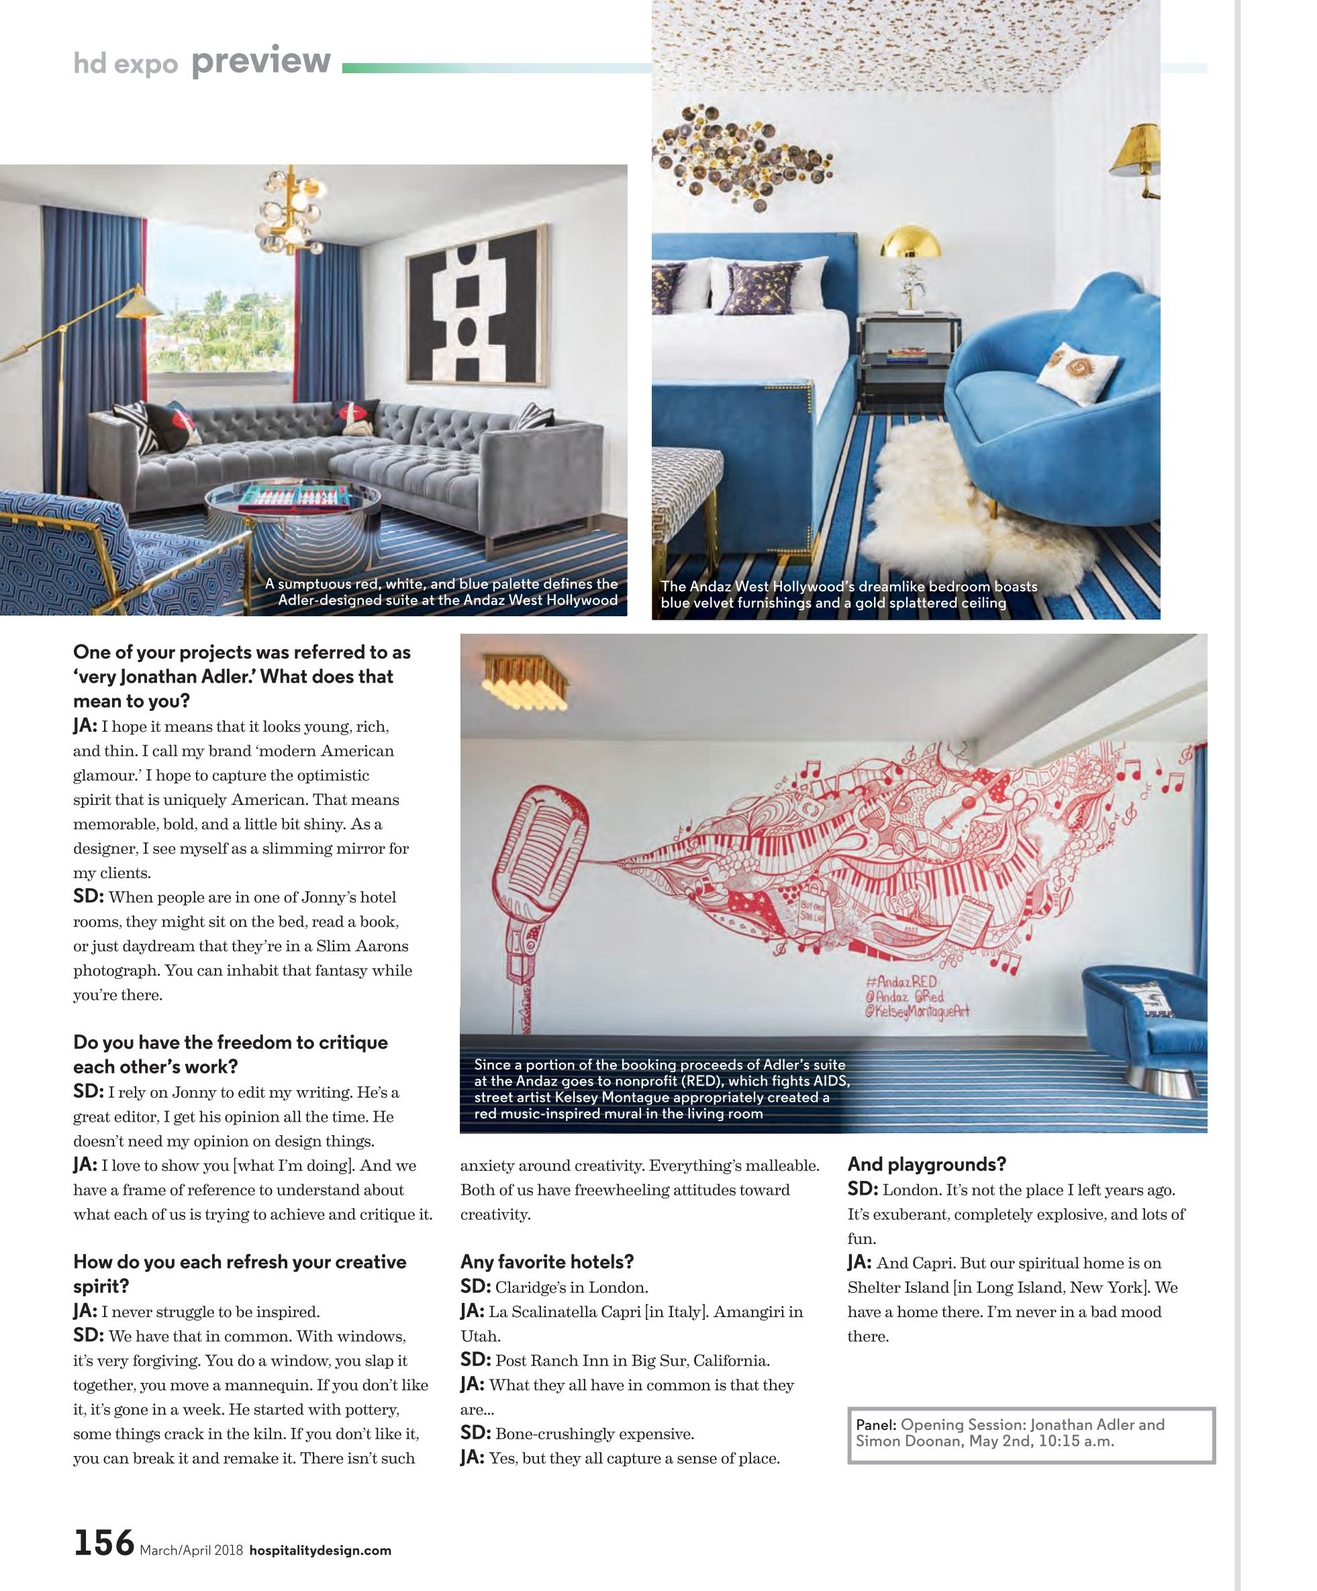 Hospitality Design - March/April 2018